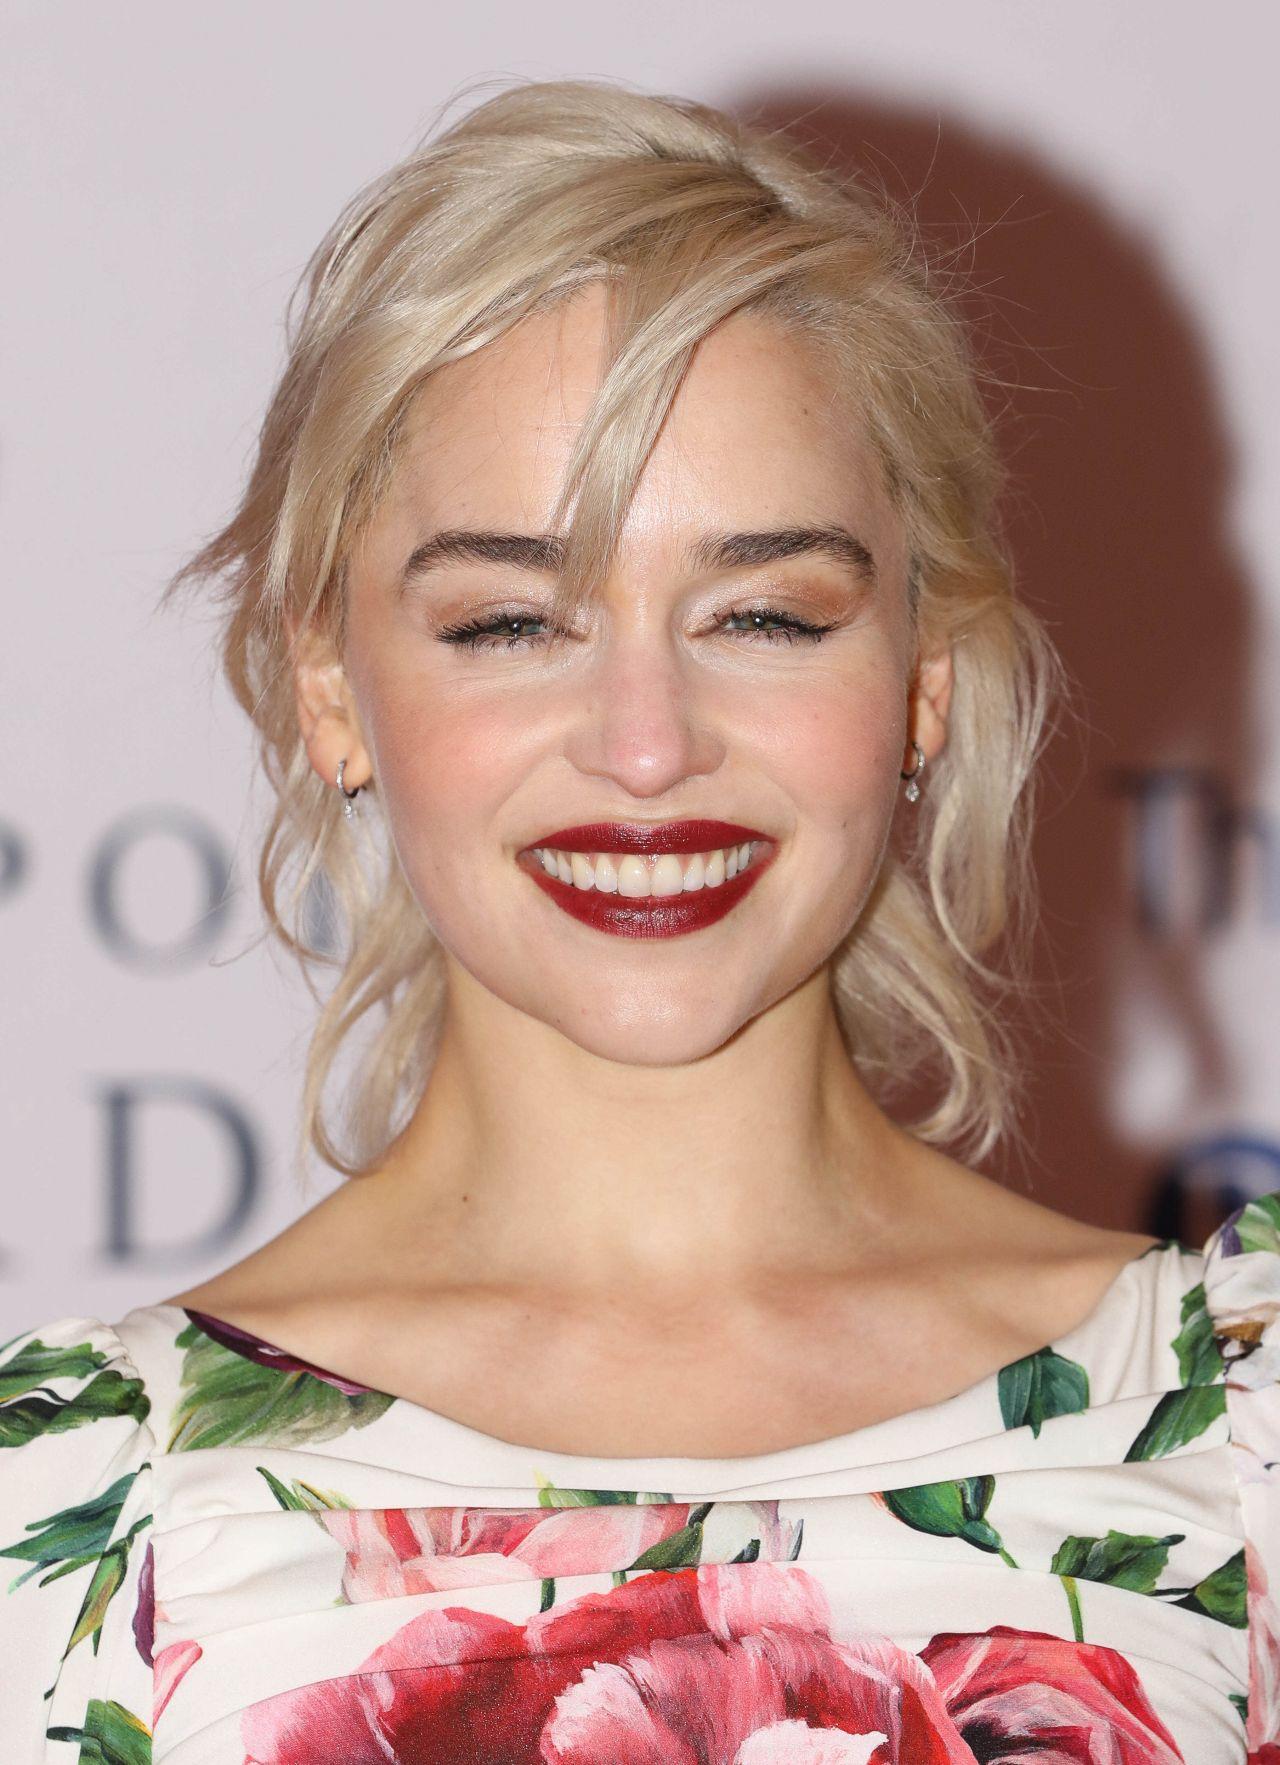 Emilia Clarke Centrepoint Awards In London on Kensington Palace London